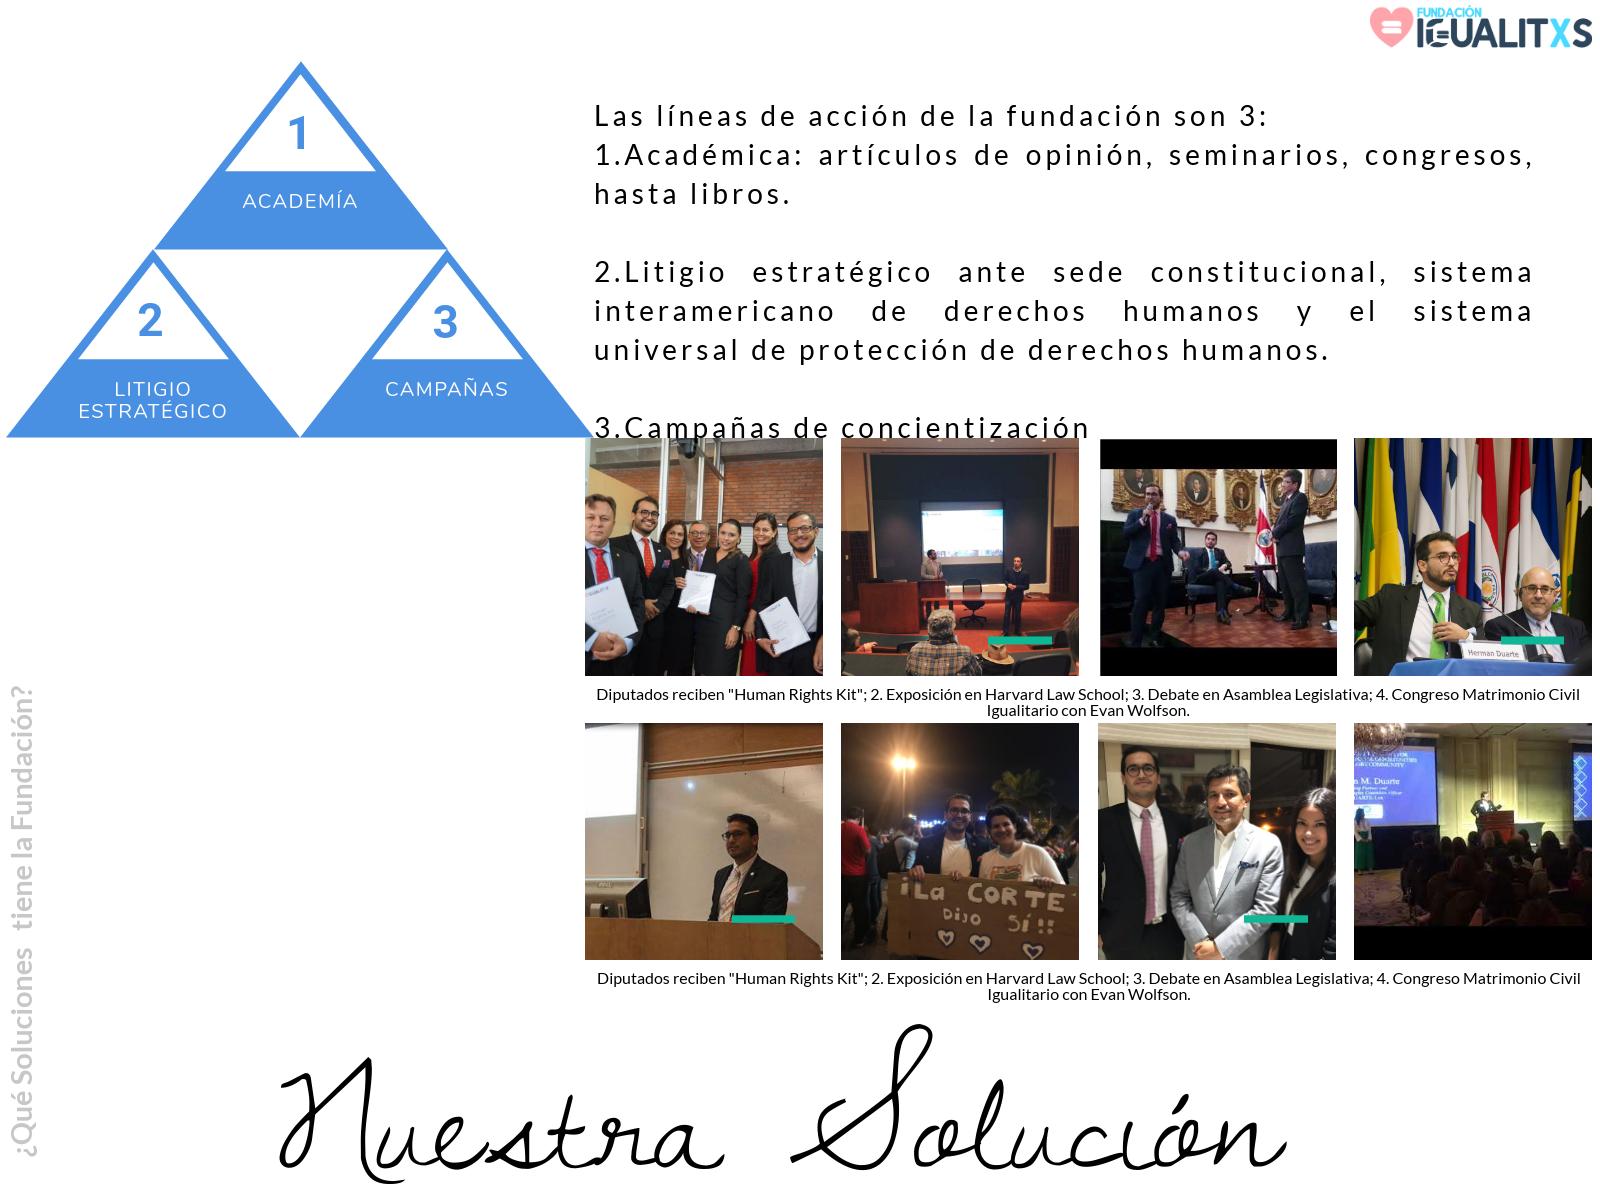 Fundacion-Igualitxs-Harvard-Law-School-Victor-Madrigal-Borloz